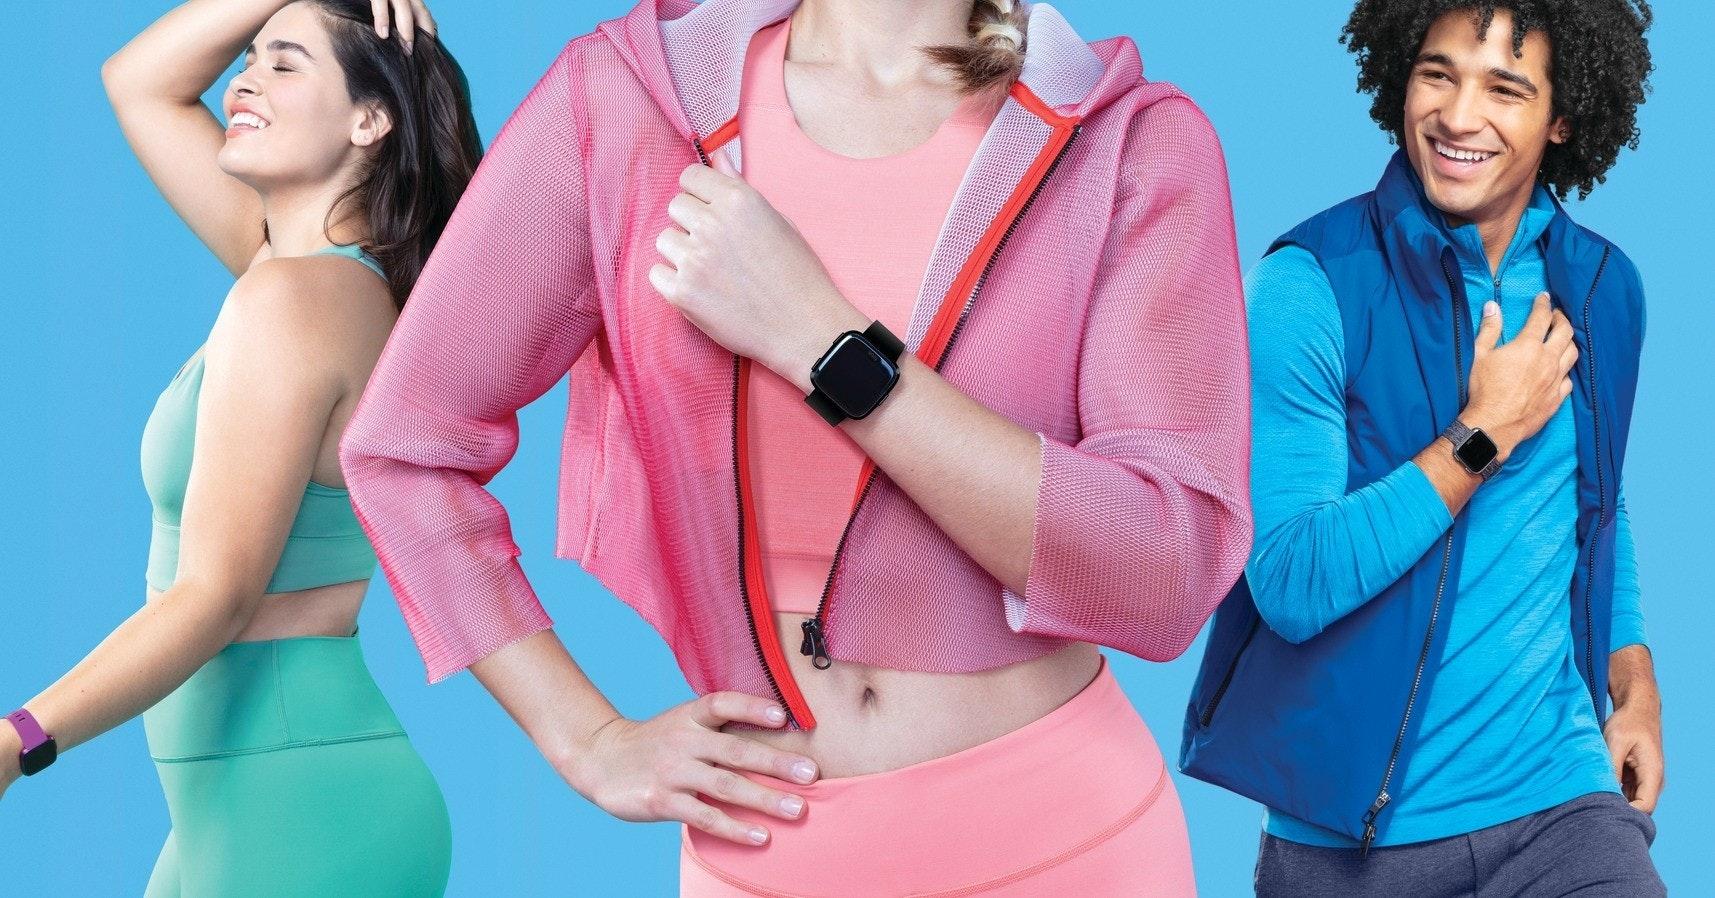 , Fitbit, Apple Watch, Smartwatch, Outerwear, Light, Shoulder, Apple, Textile, Pink M, clothing, Abdomen, Pink, Shoulder, Arm, Outerwear, Neck, Waist, Stomach, Trunk, Sleeve